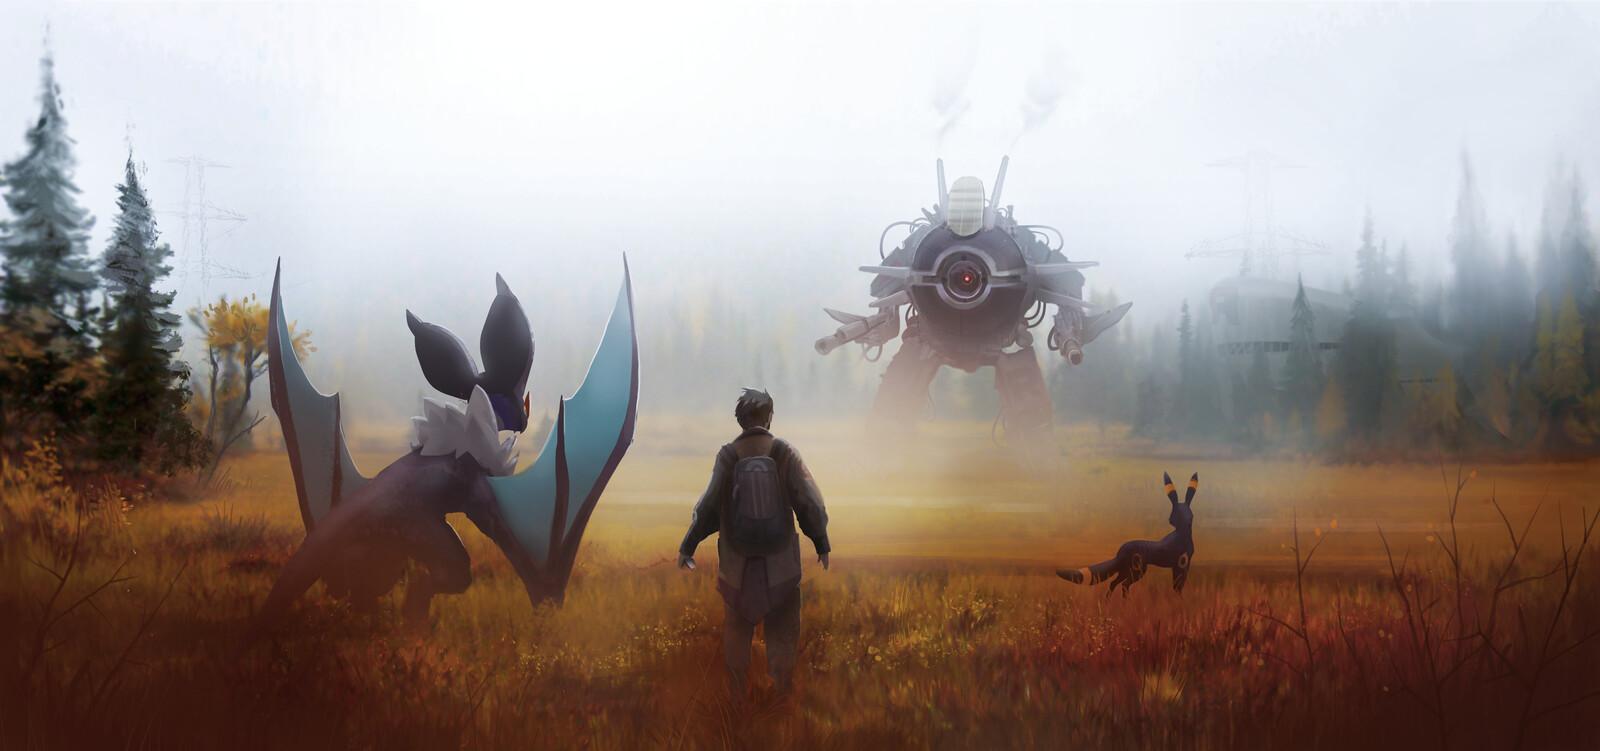 Team Rocket Mech wants to battle